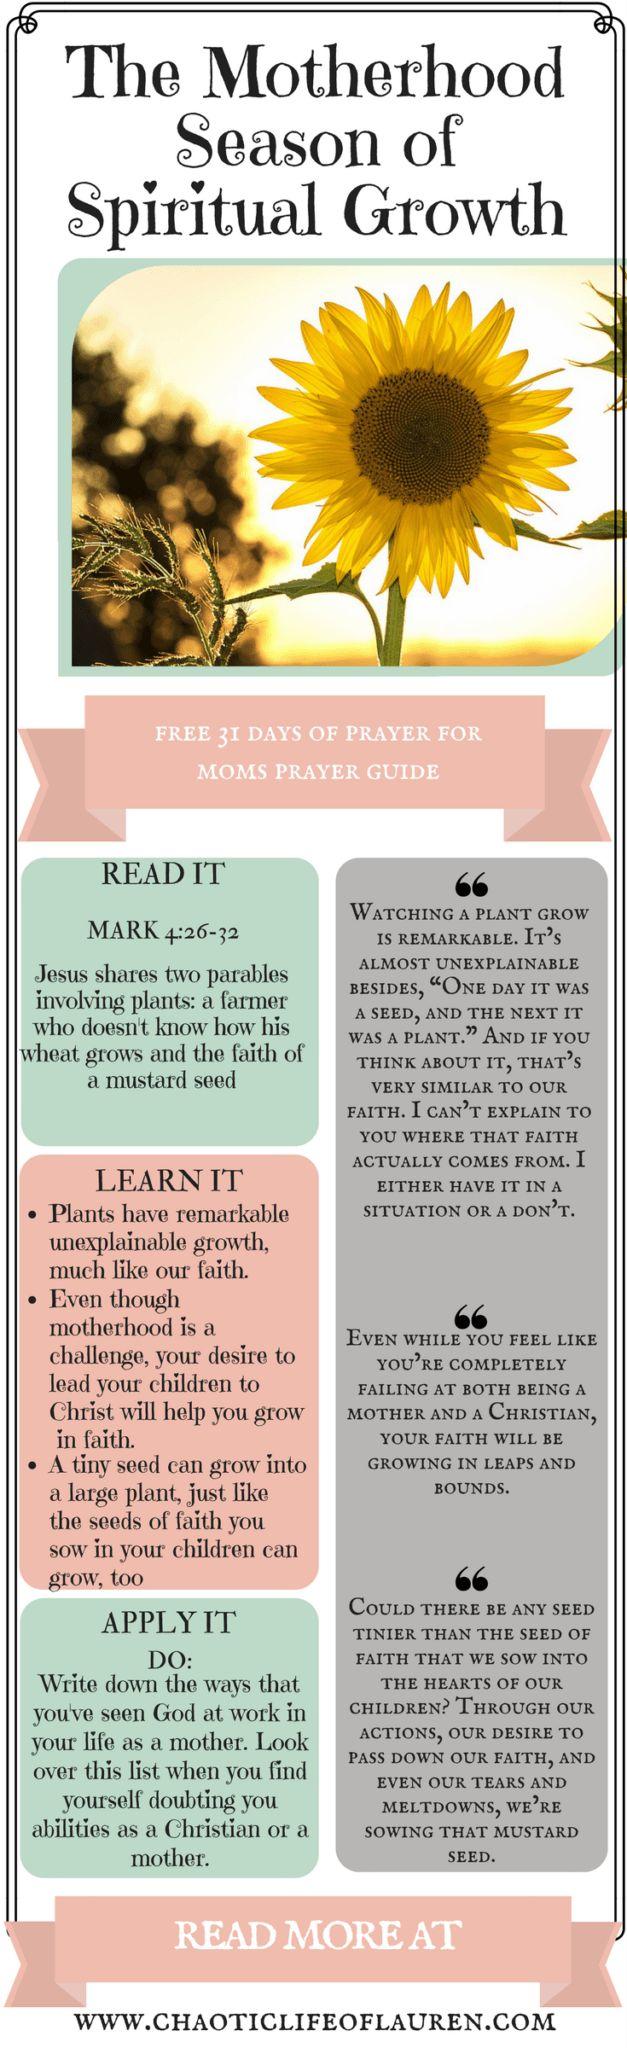 What does a season of Spiritual growth look like in a mother's life? | Christian Motherhood | Faith | Devotional | Inspirational | Biblical Womanhood | Christian Lifestyle | Raising Kids | Raising Children